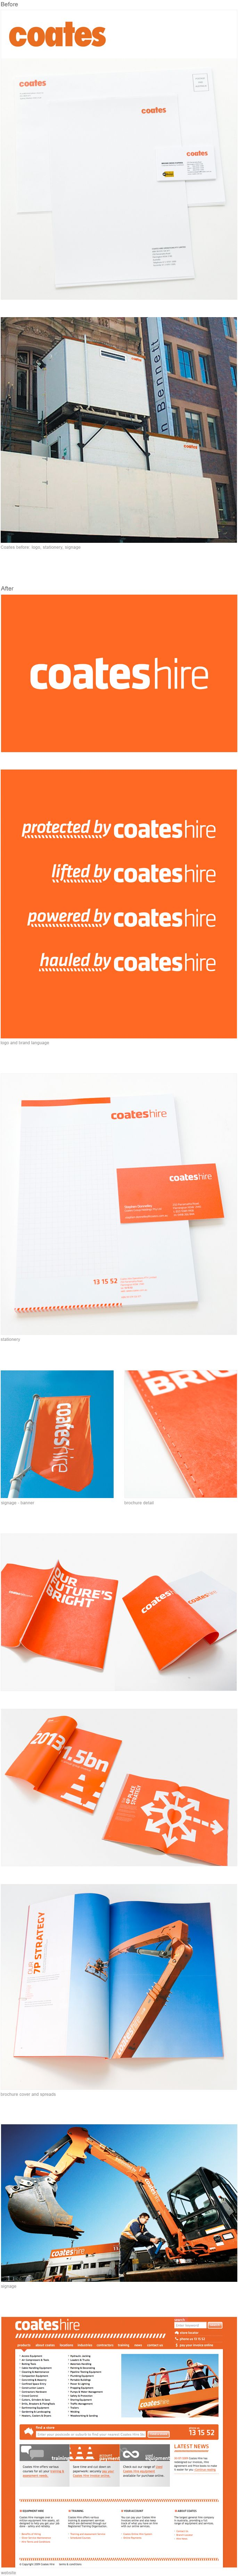 Client: CoatesHire - www.coates.com.au www.ideaworks.com.au #rebrand #stationary